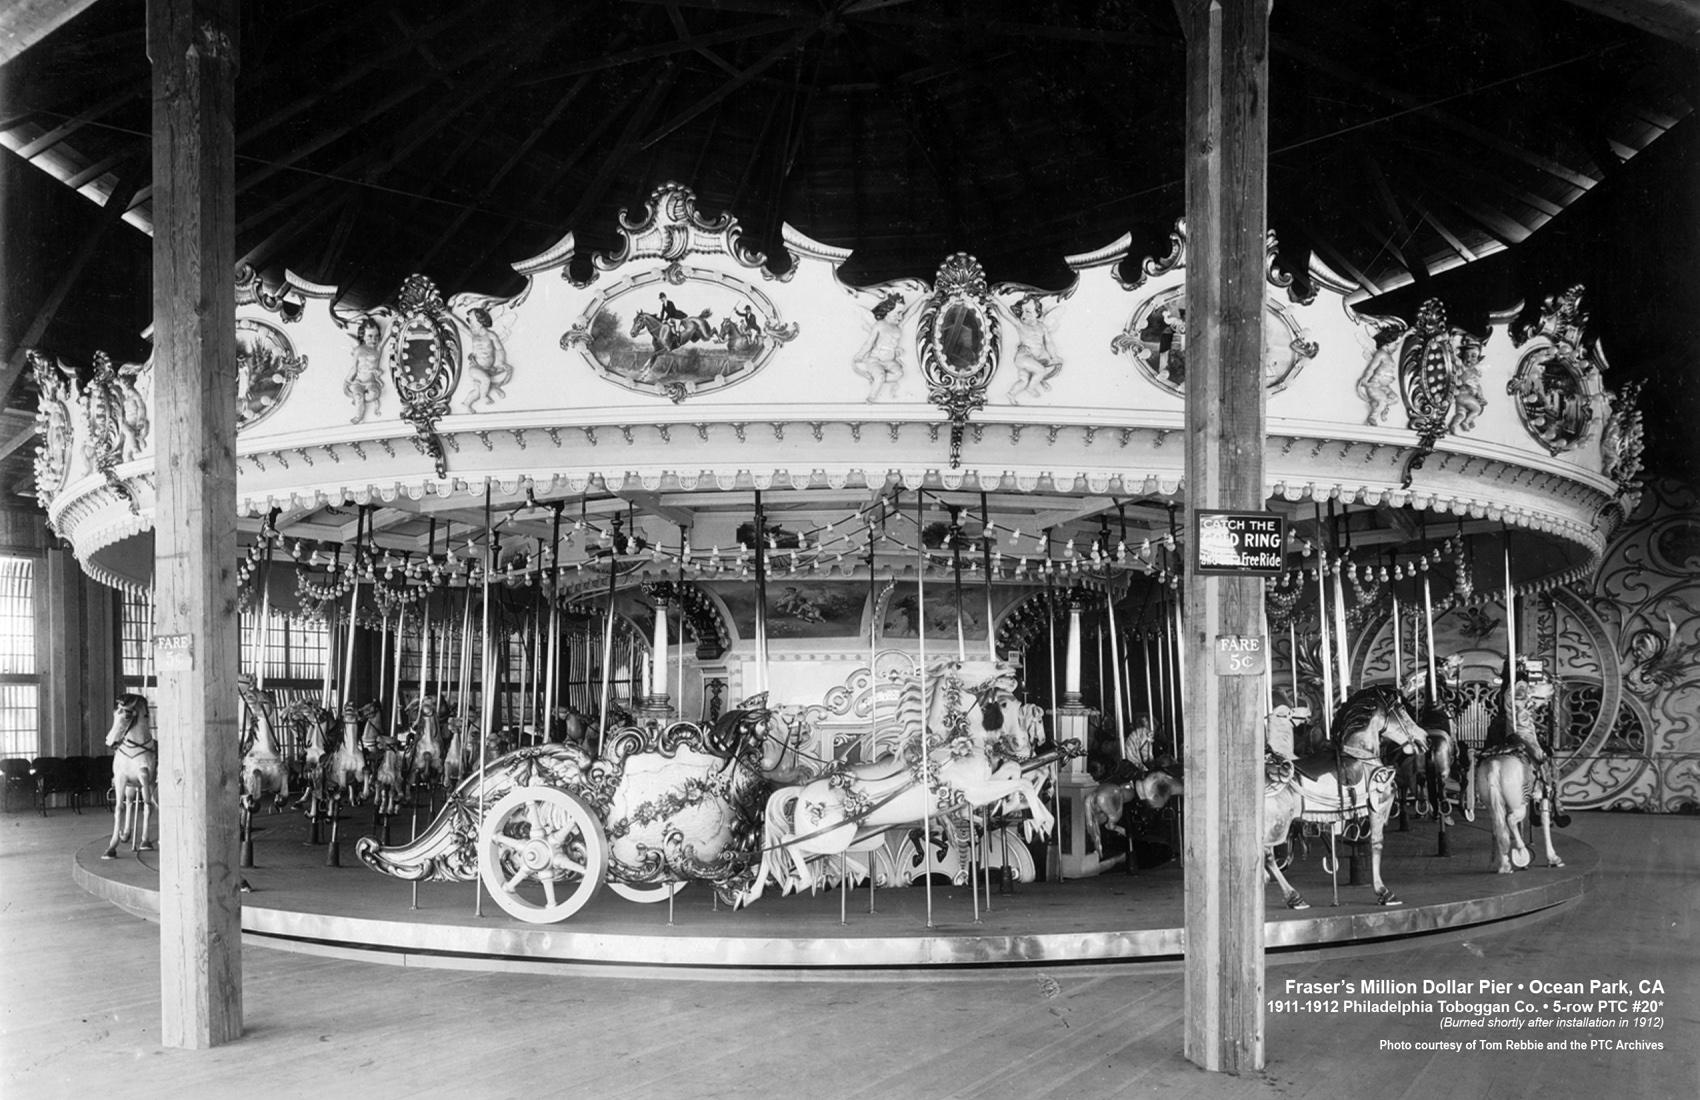 PTC-20-Carousel-1912-Frasers-Million-Dollar-Pier-Ocean-Park-CA-Nov-Dec-132